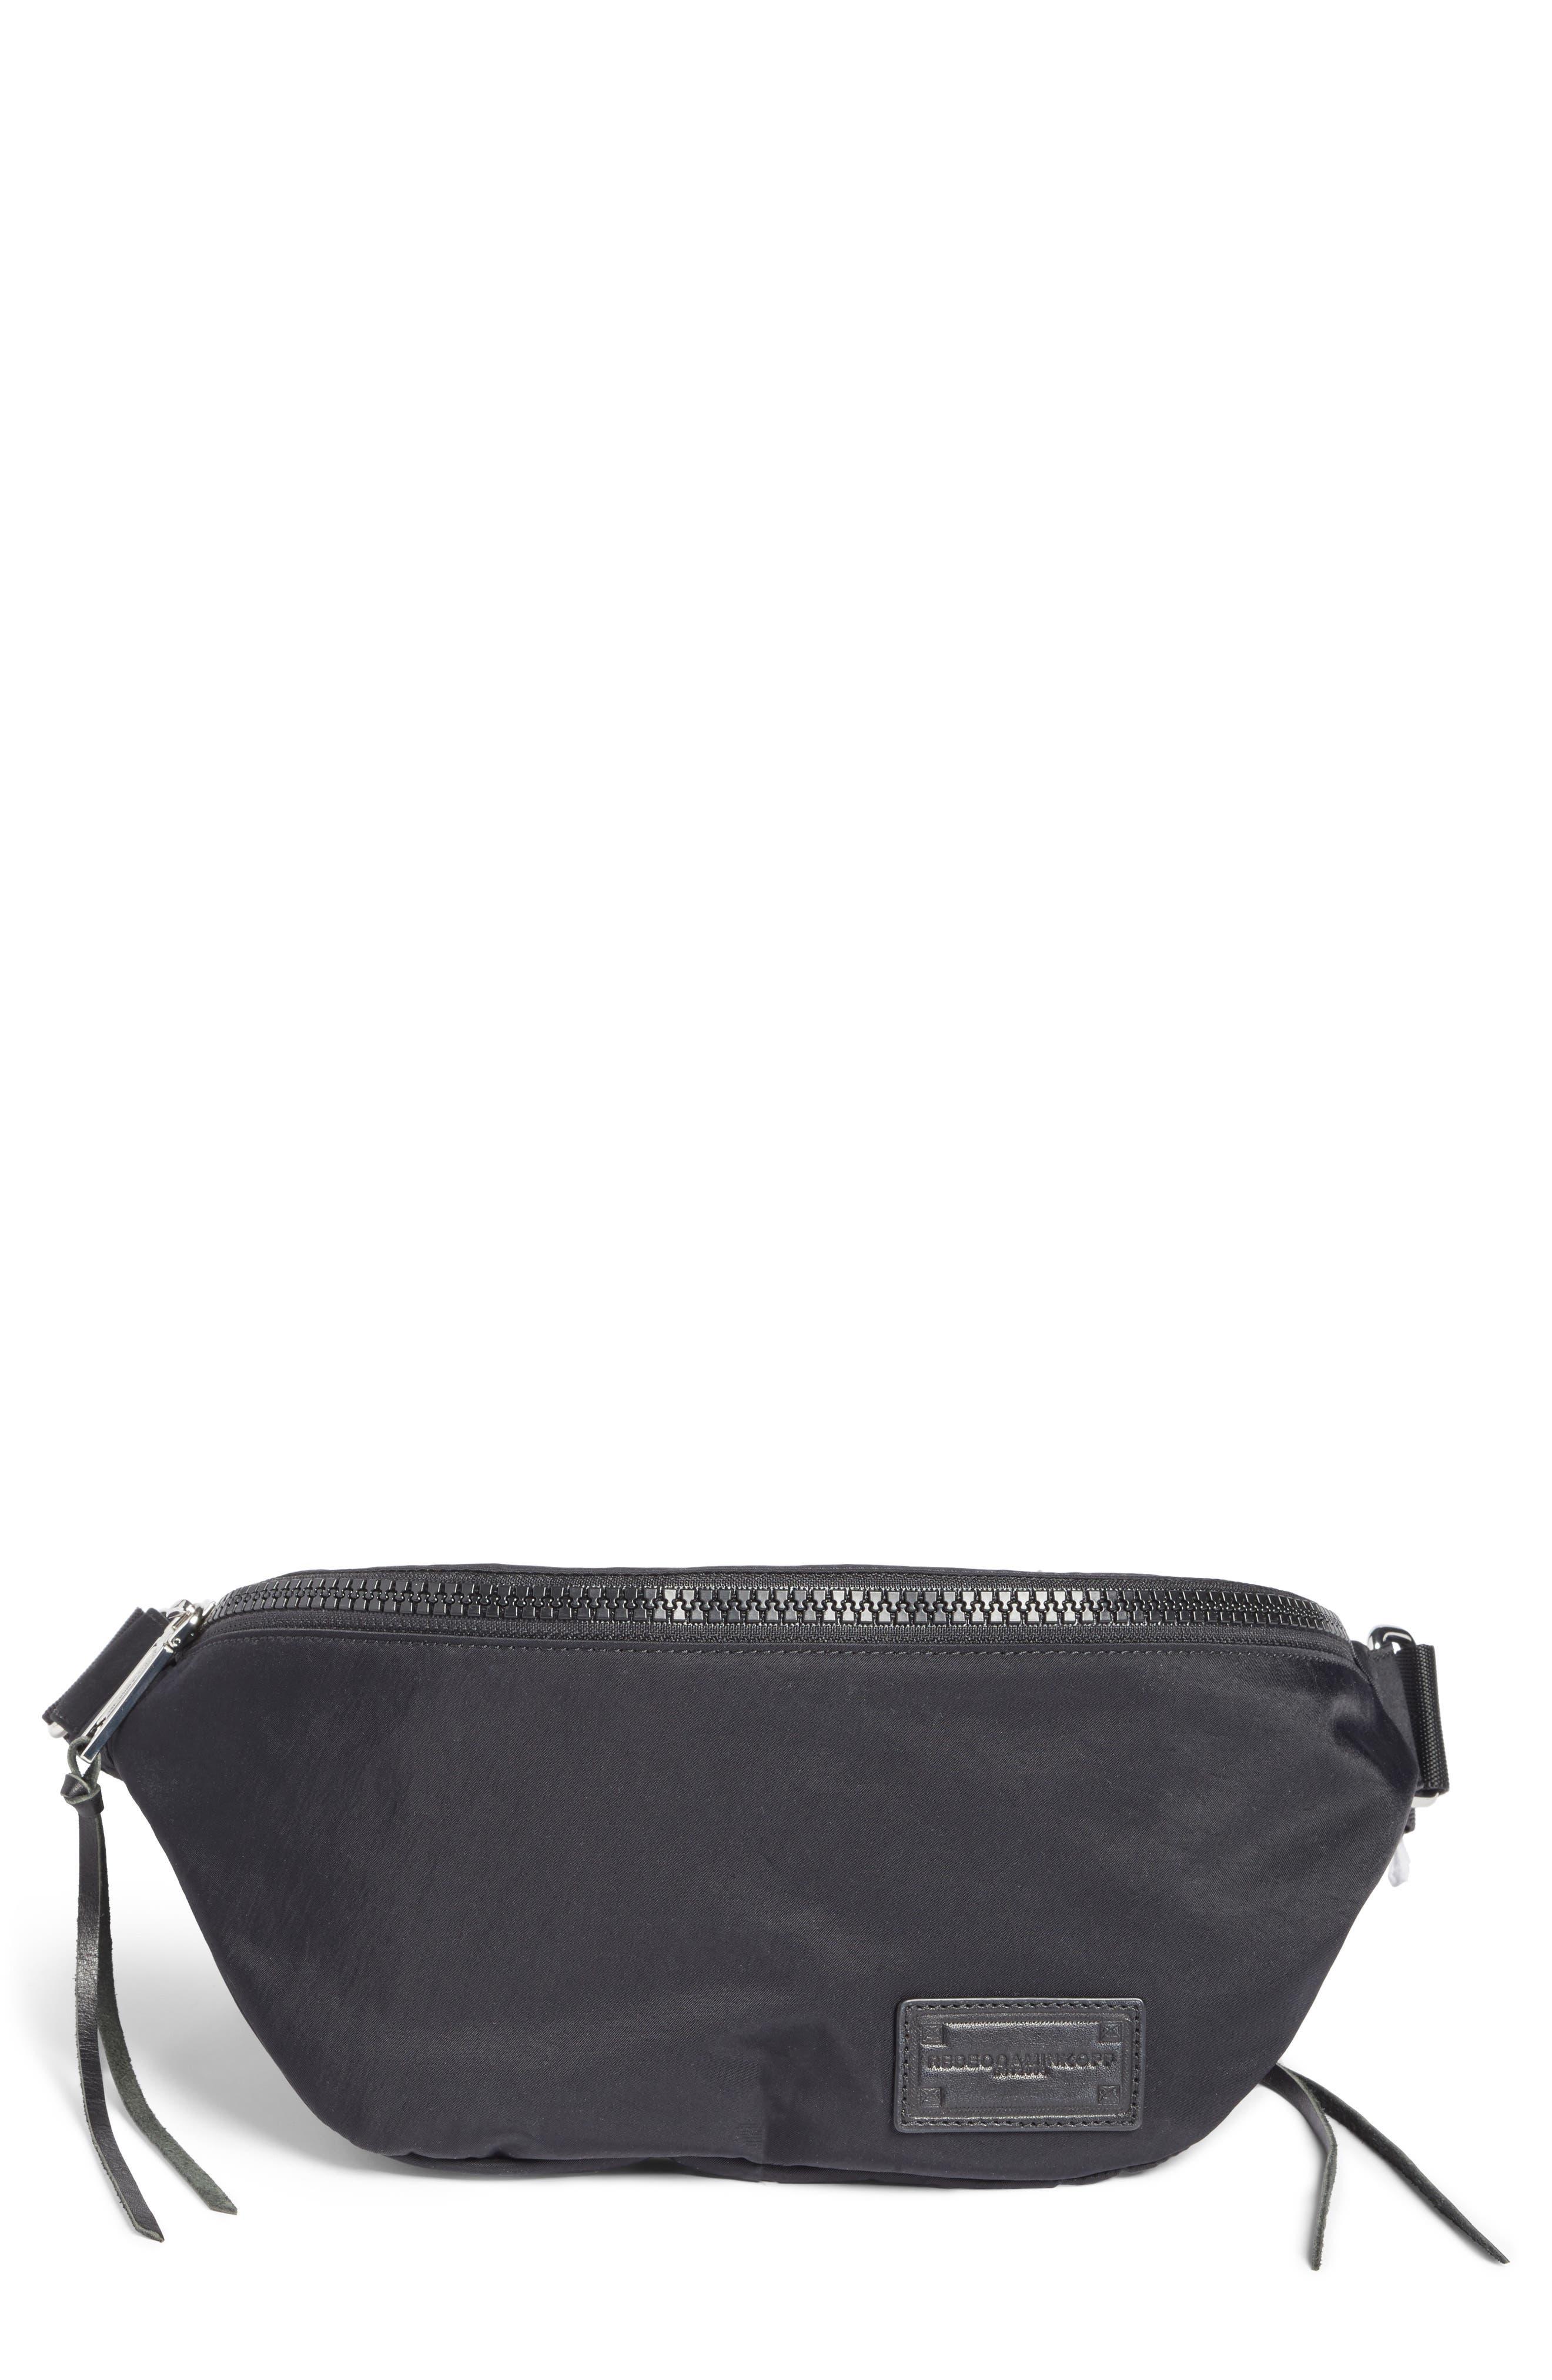 REBECCA MINKOFF, Nylon Belt Bag, Main thumbnail 1, color, BLACK